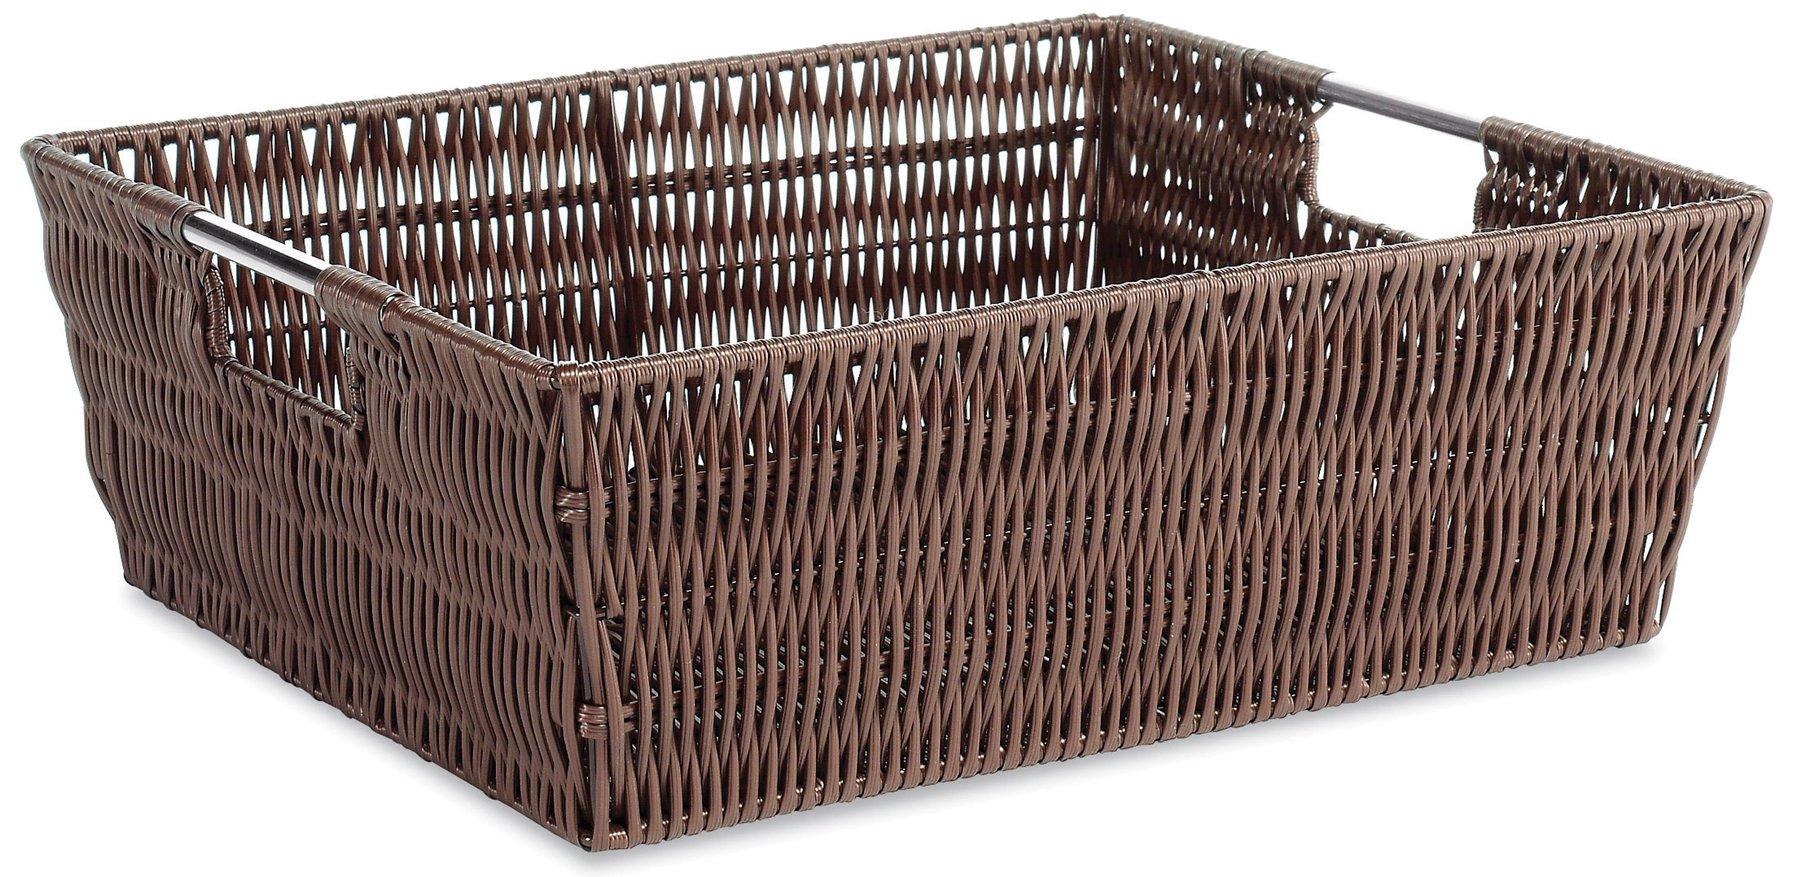 Whitmor Rattique Shelf Storage Tote Basket - Java